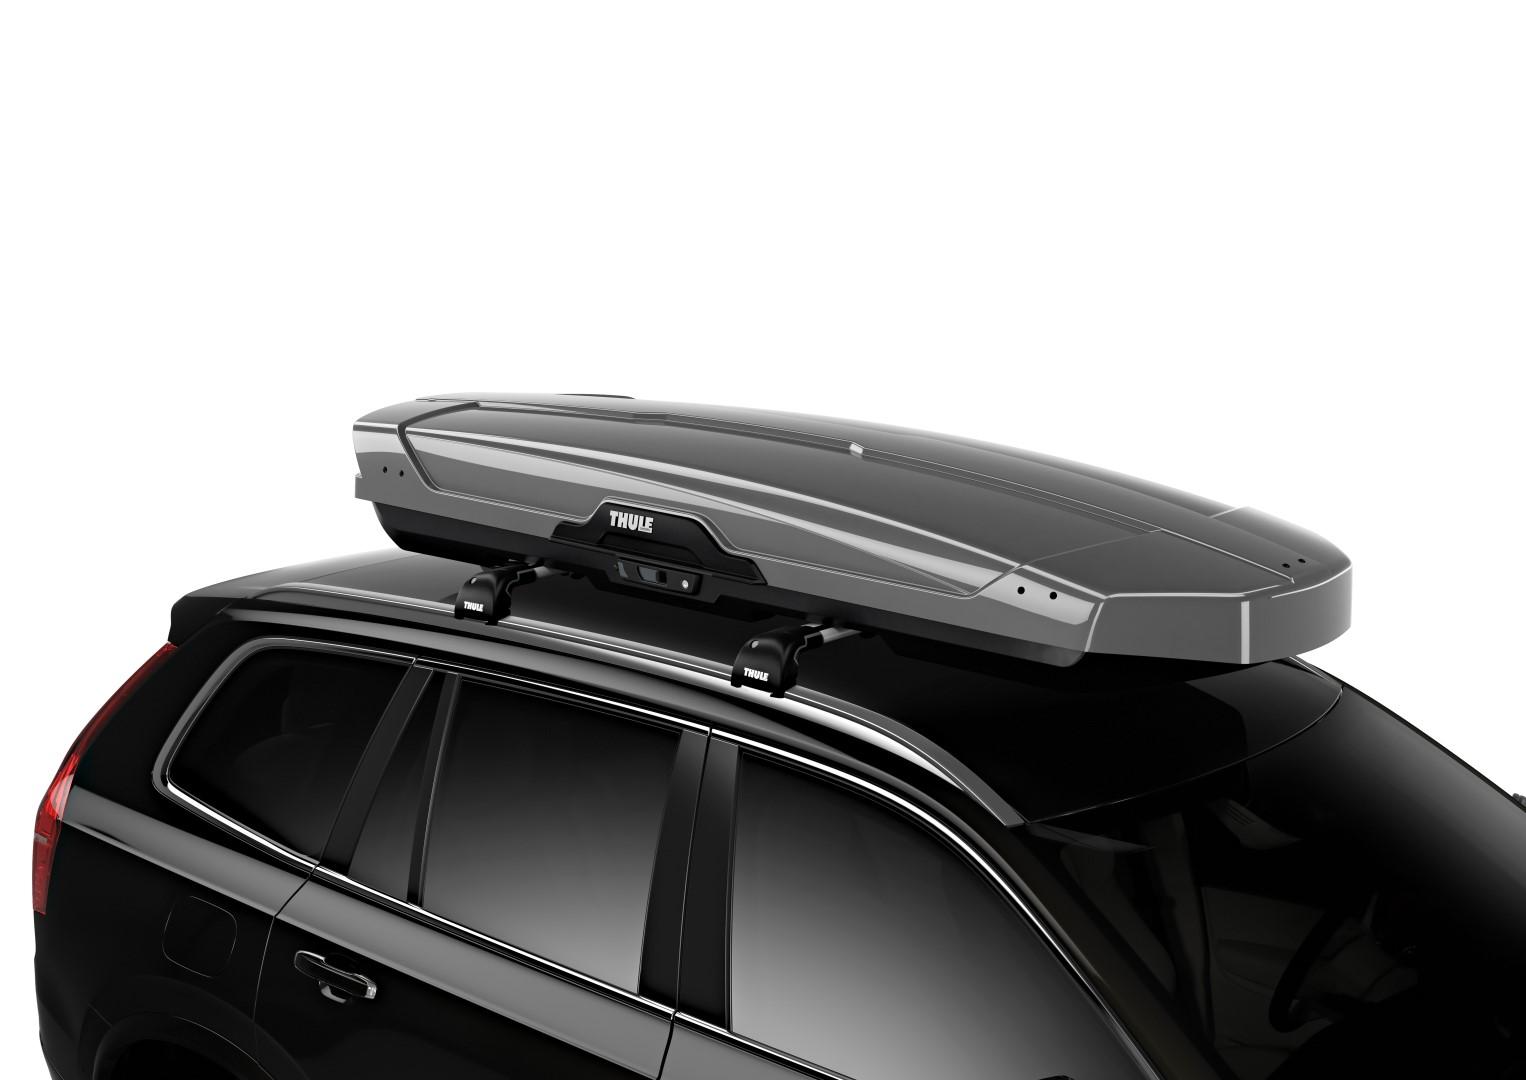 autobox thule motion xt alpine 500 leskl titanov. Black Bedroom Furniture Sets. Home Design Ideas